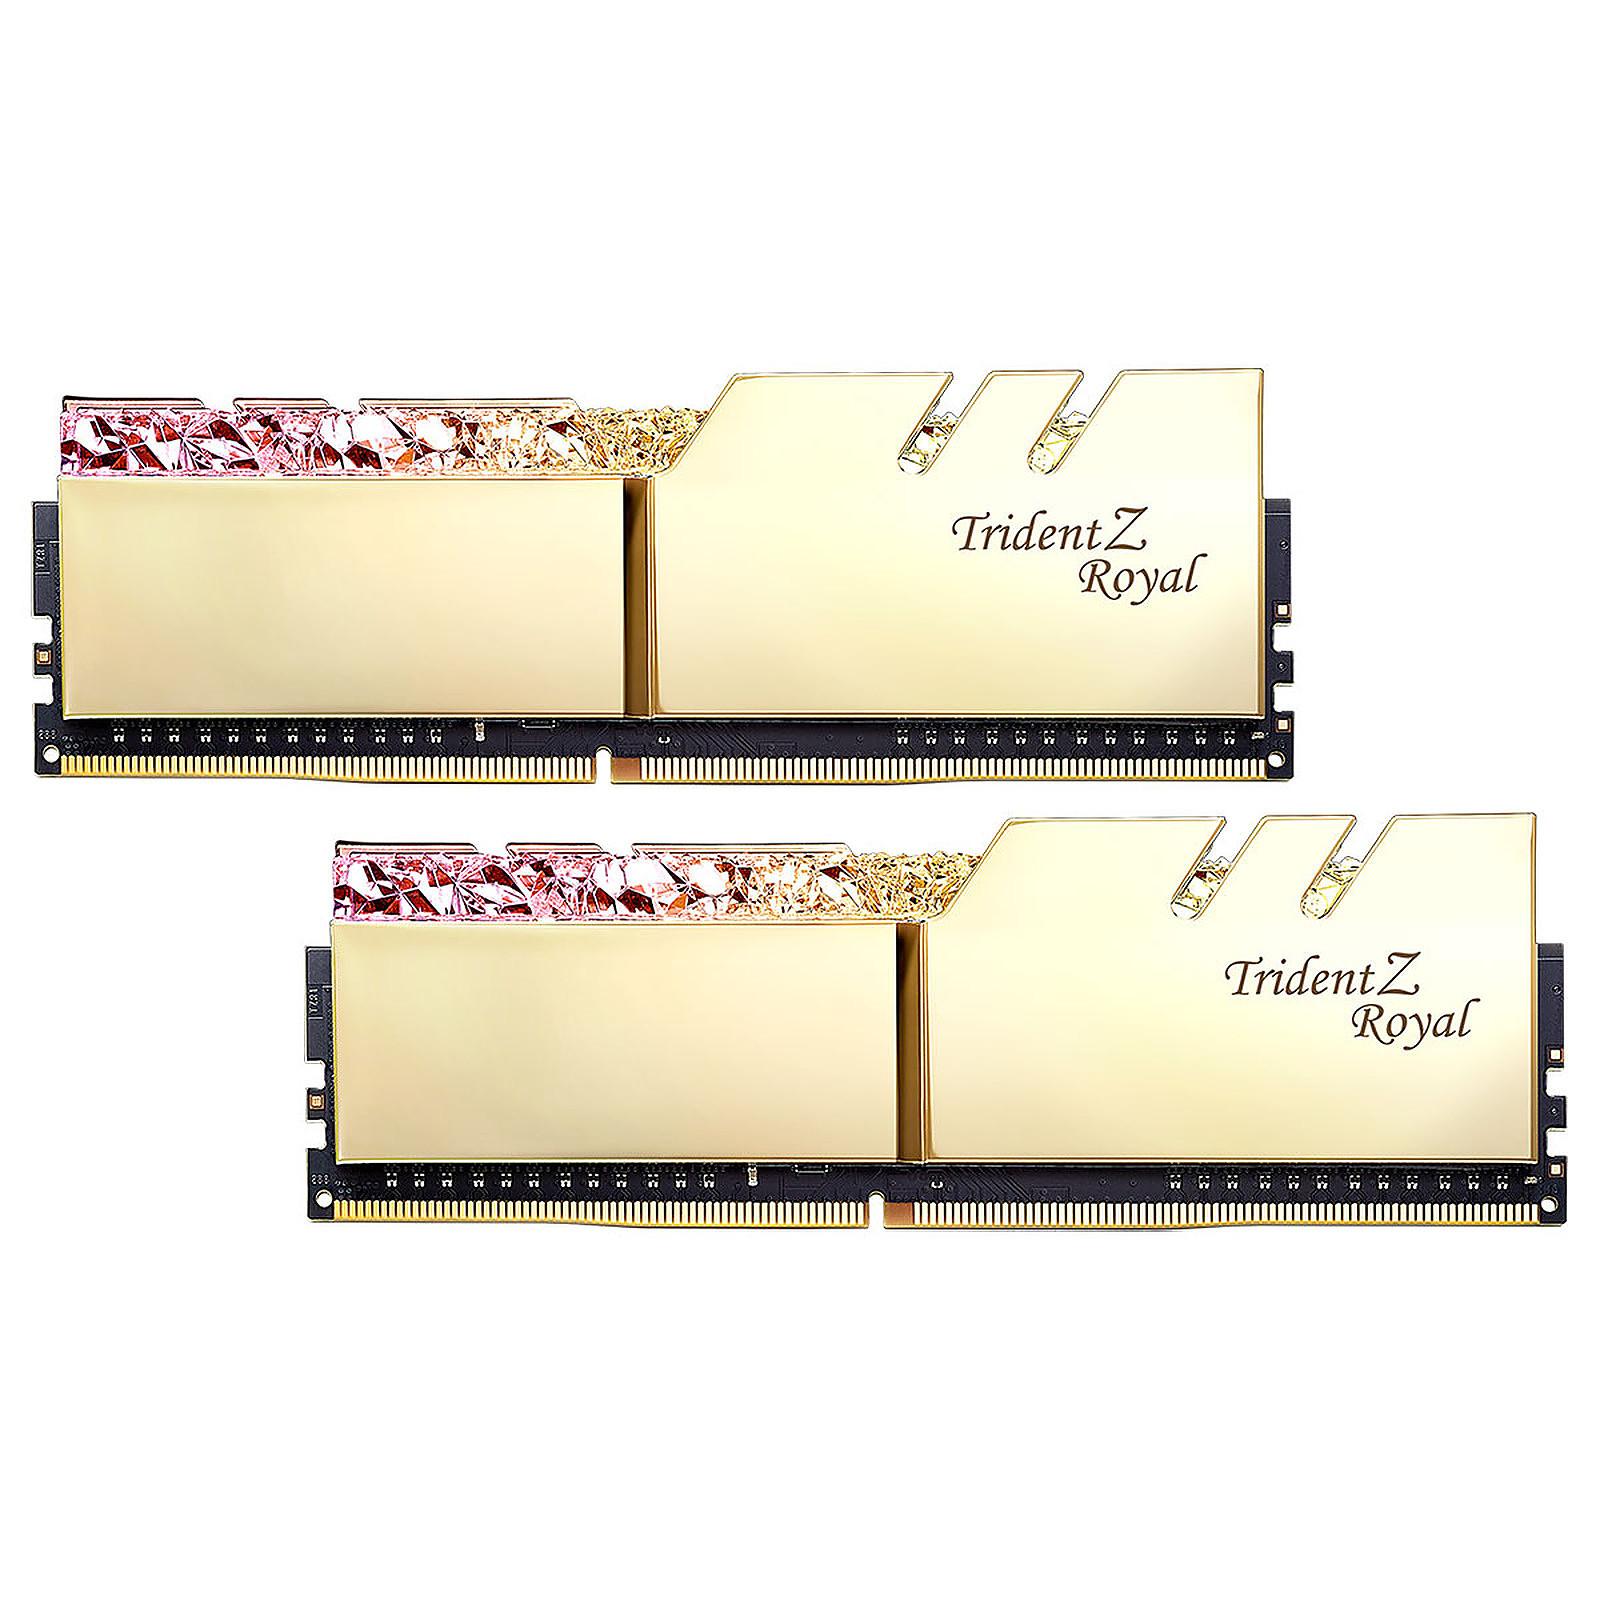 G.Skill Trident Z Royal 16 Go (2 x 8 Go) DDR4 4400 MHz CL18 - Or